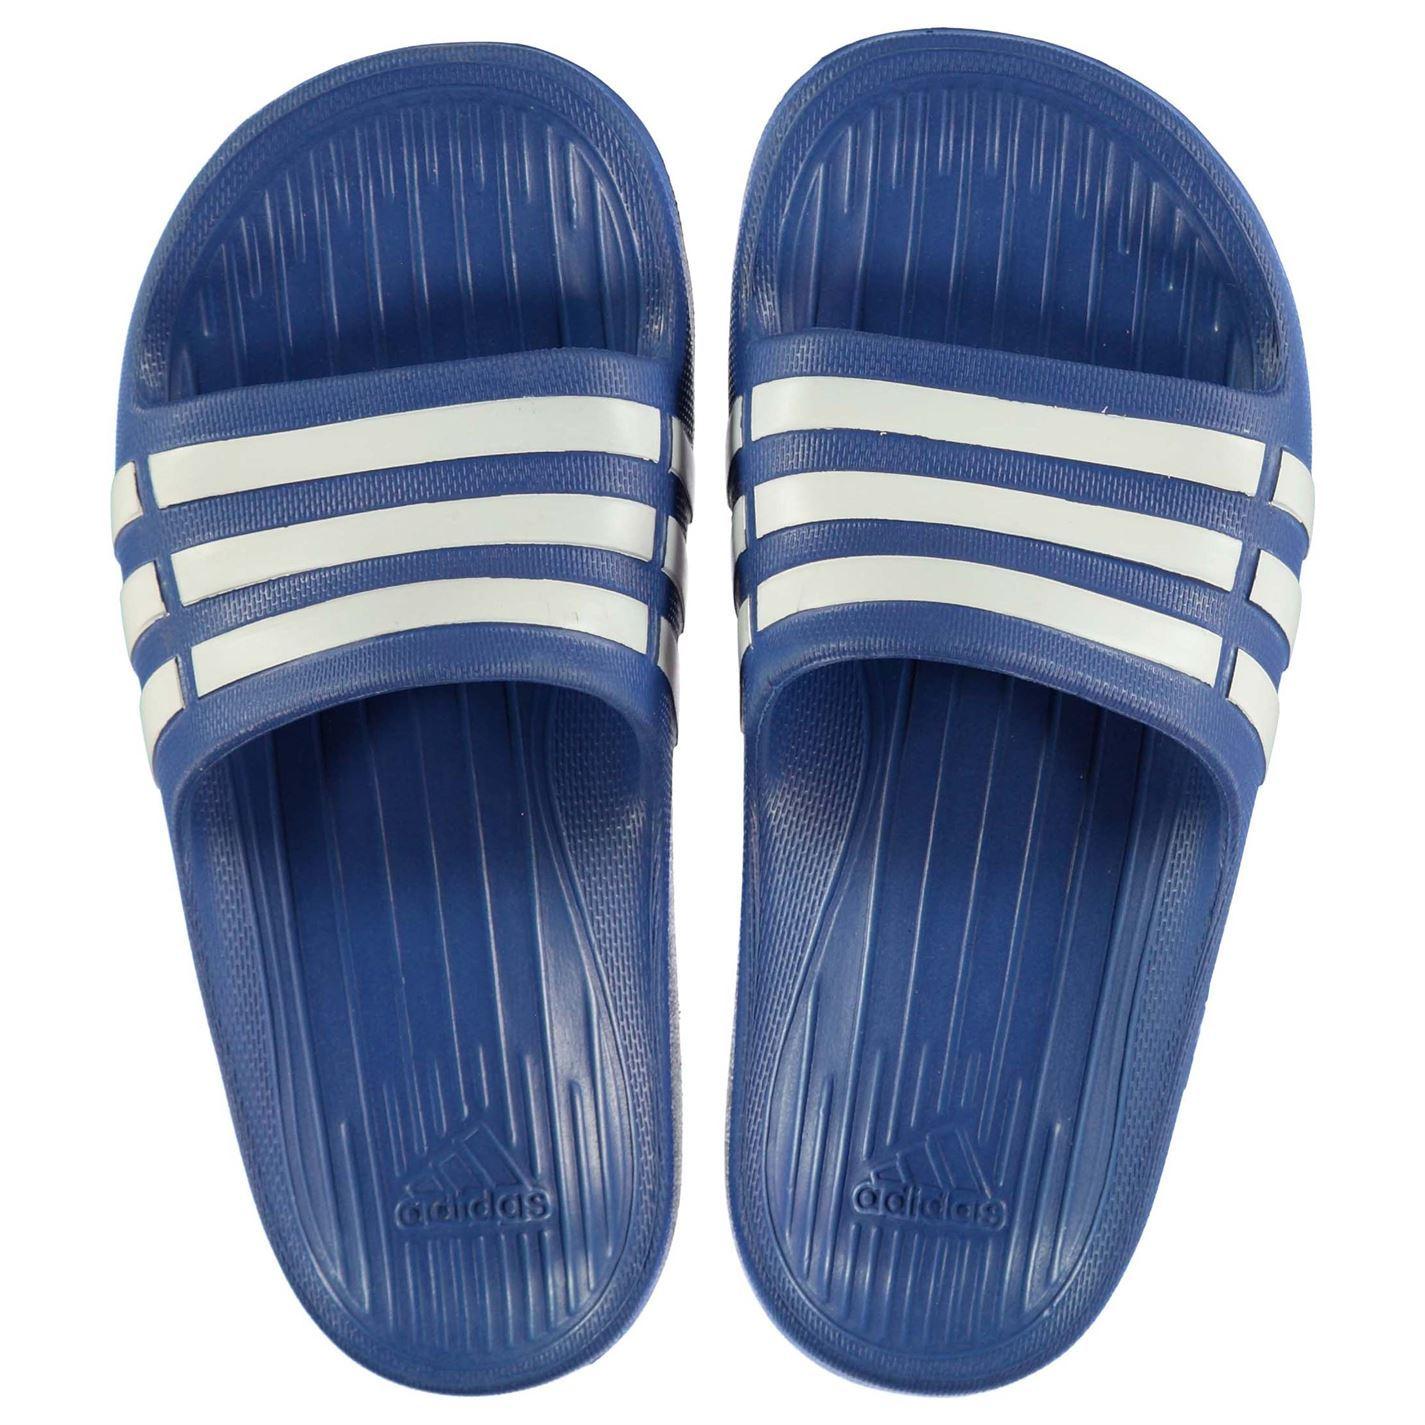 miniatura 12 - ADIDAS-Duramo-Slide-Piscina-Scarpe-Bambino-Ragazzo-Sandali-Infradito-Spiaggia-Scarpe-Thongs